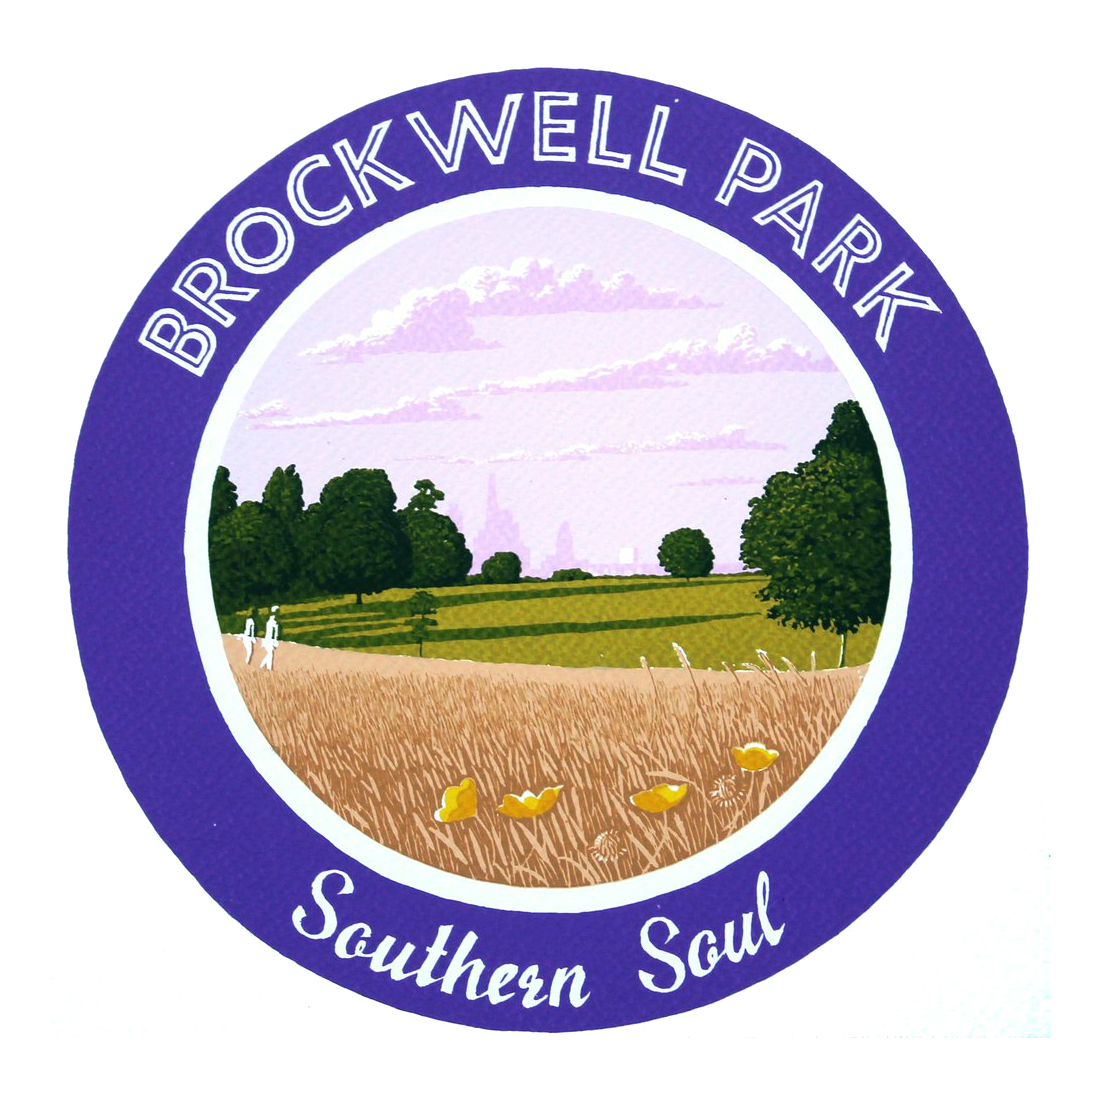 Brockwell Park, Southern Soul